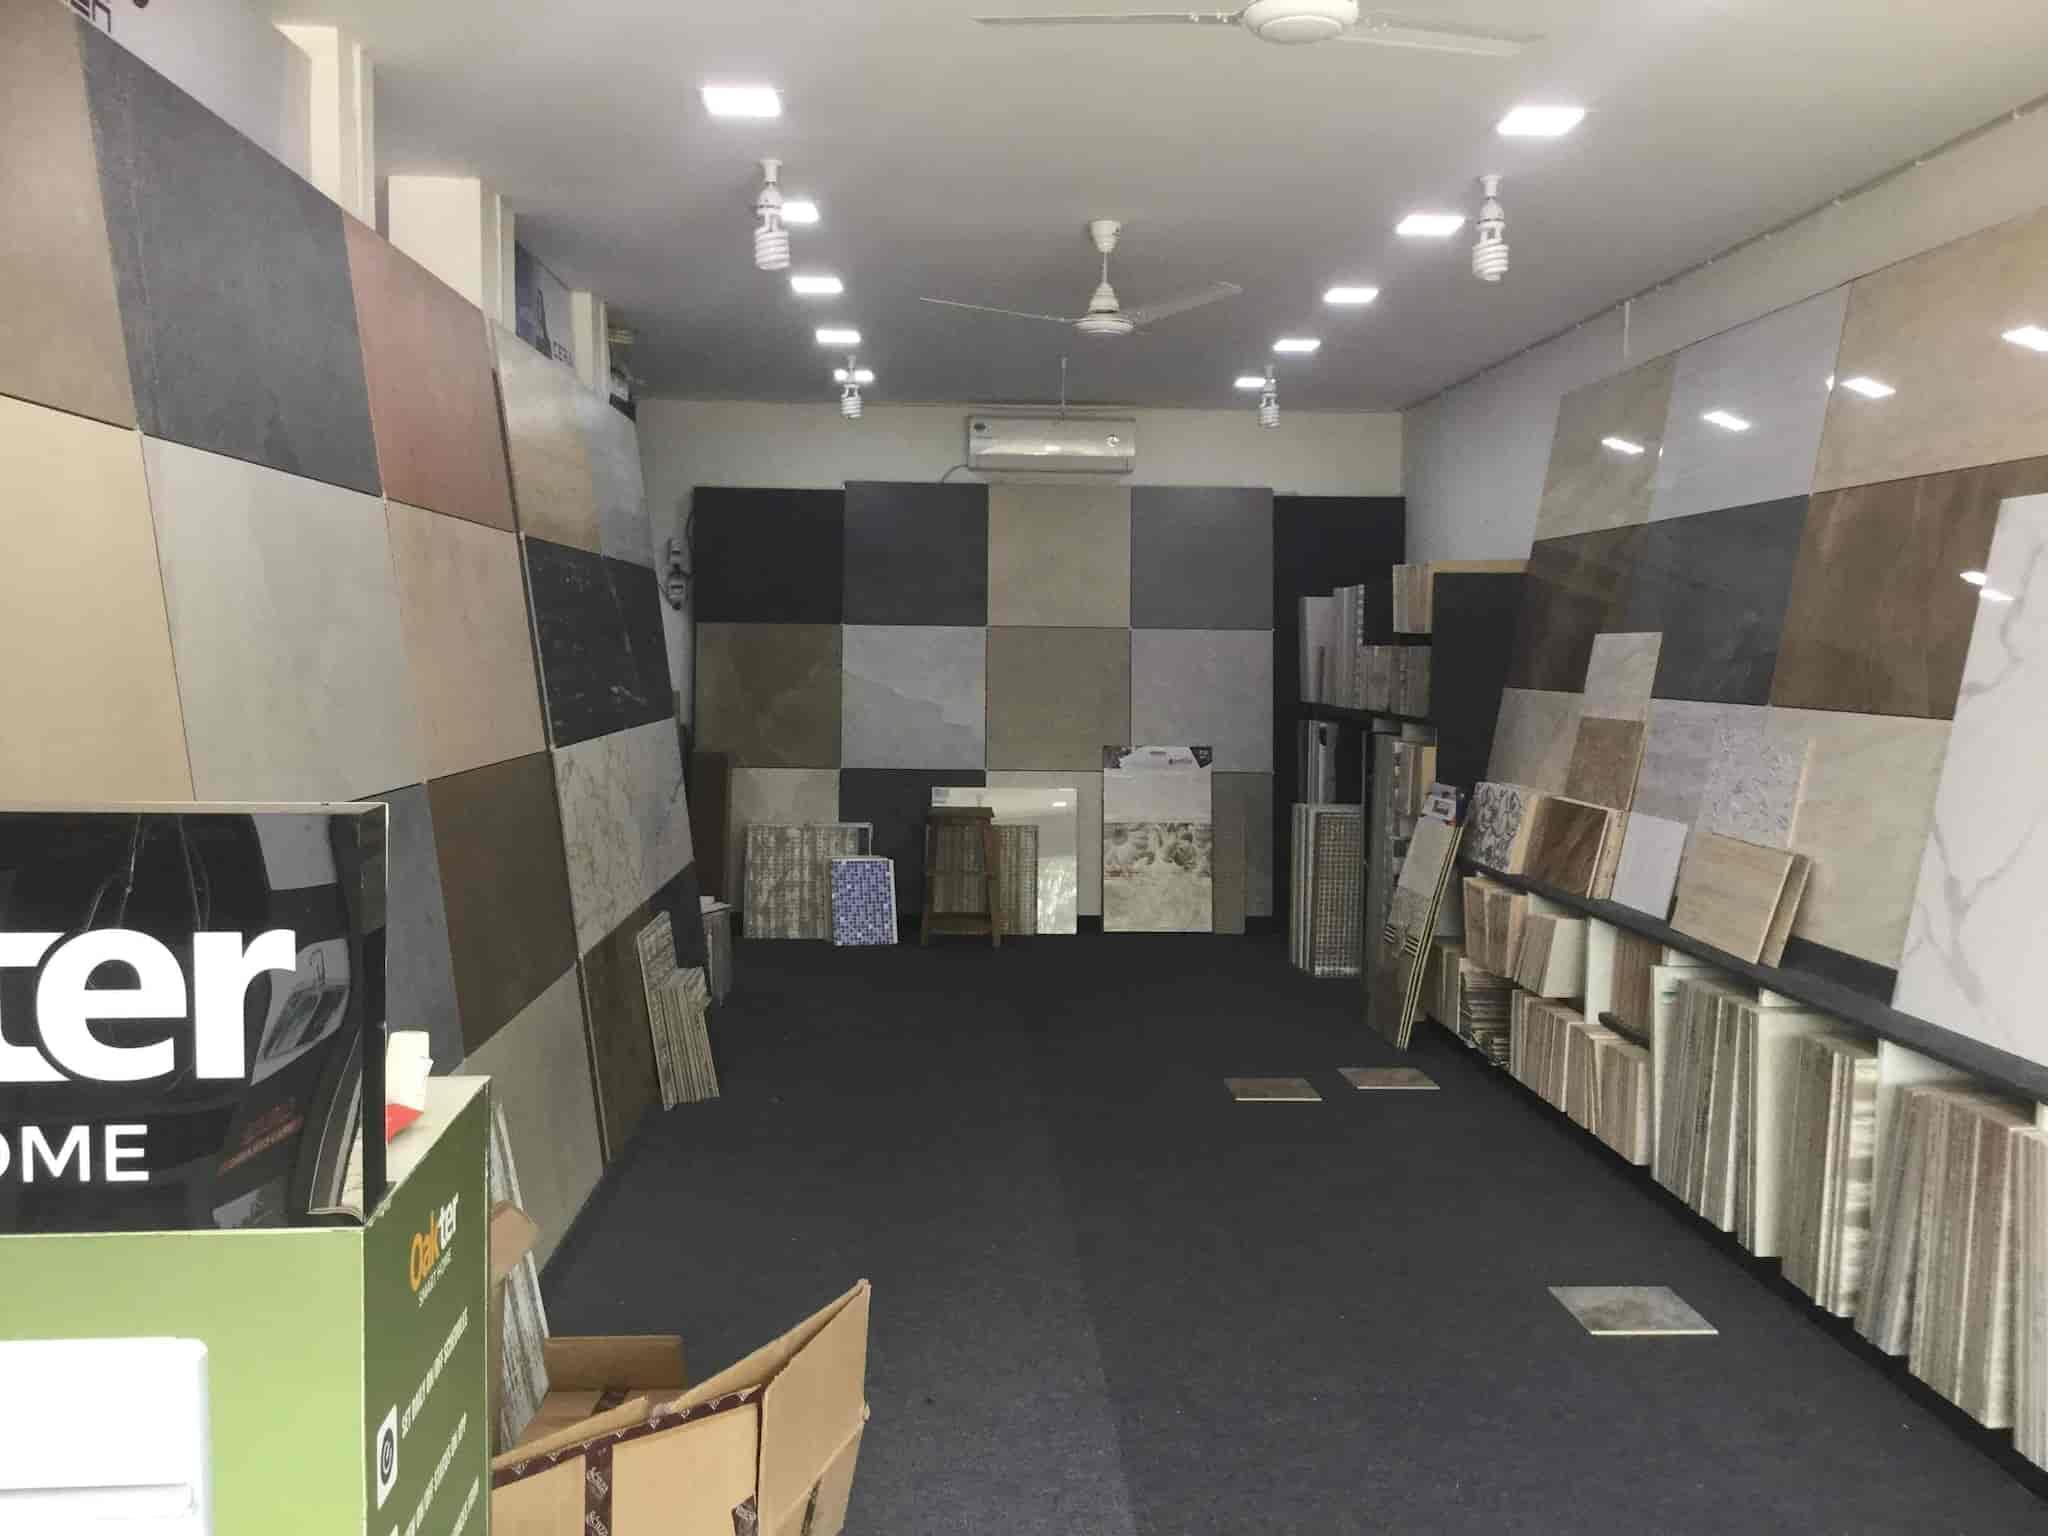 Vraj Ceramic Photos Navjivan Circle Surat Pictures Images - Ceramic tile dealers near me